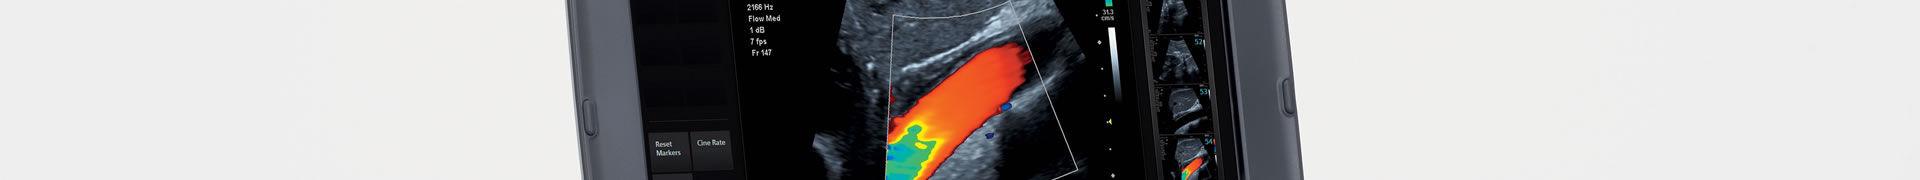 Siemans Halthineers - Advanced Ultrasound